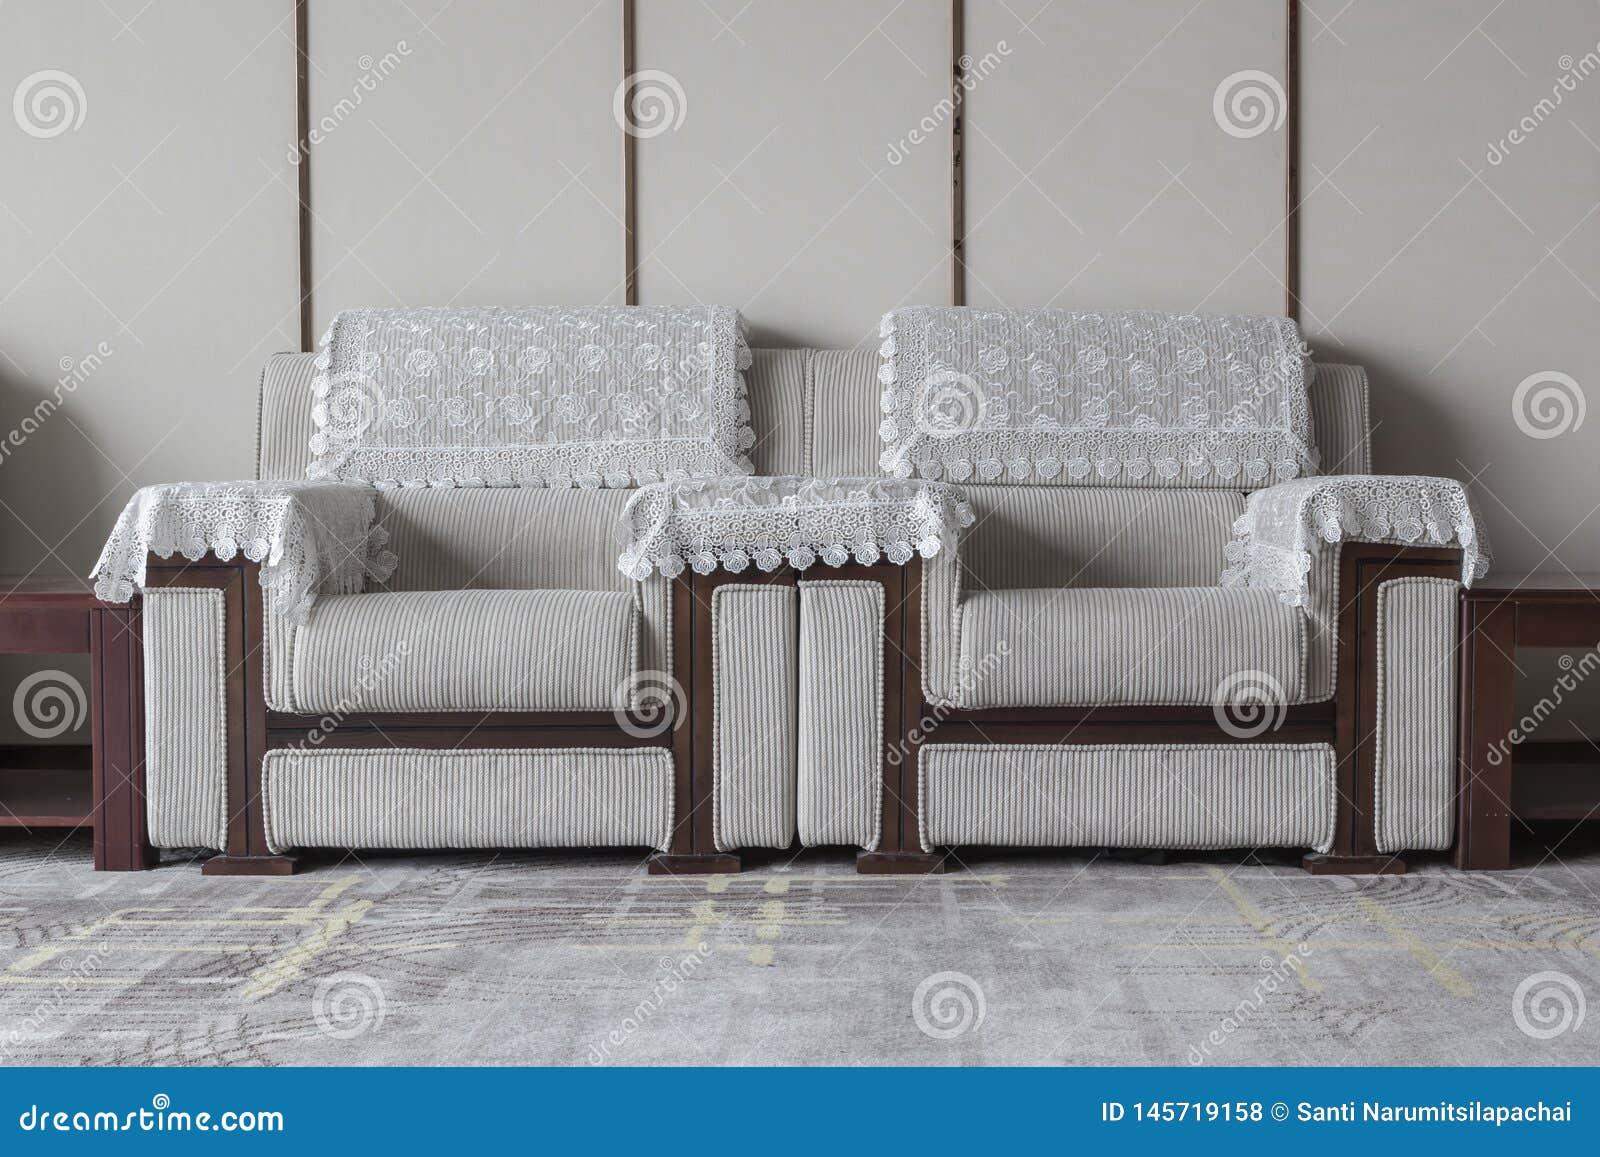 Ett par av soffan i vardagsrum med inget